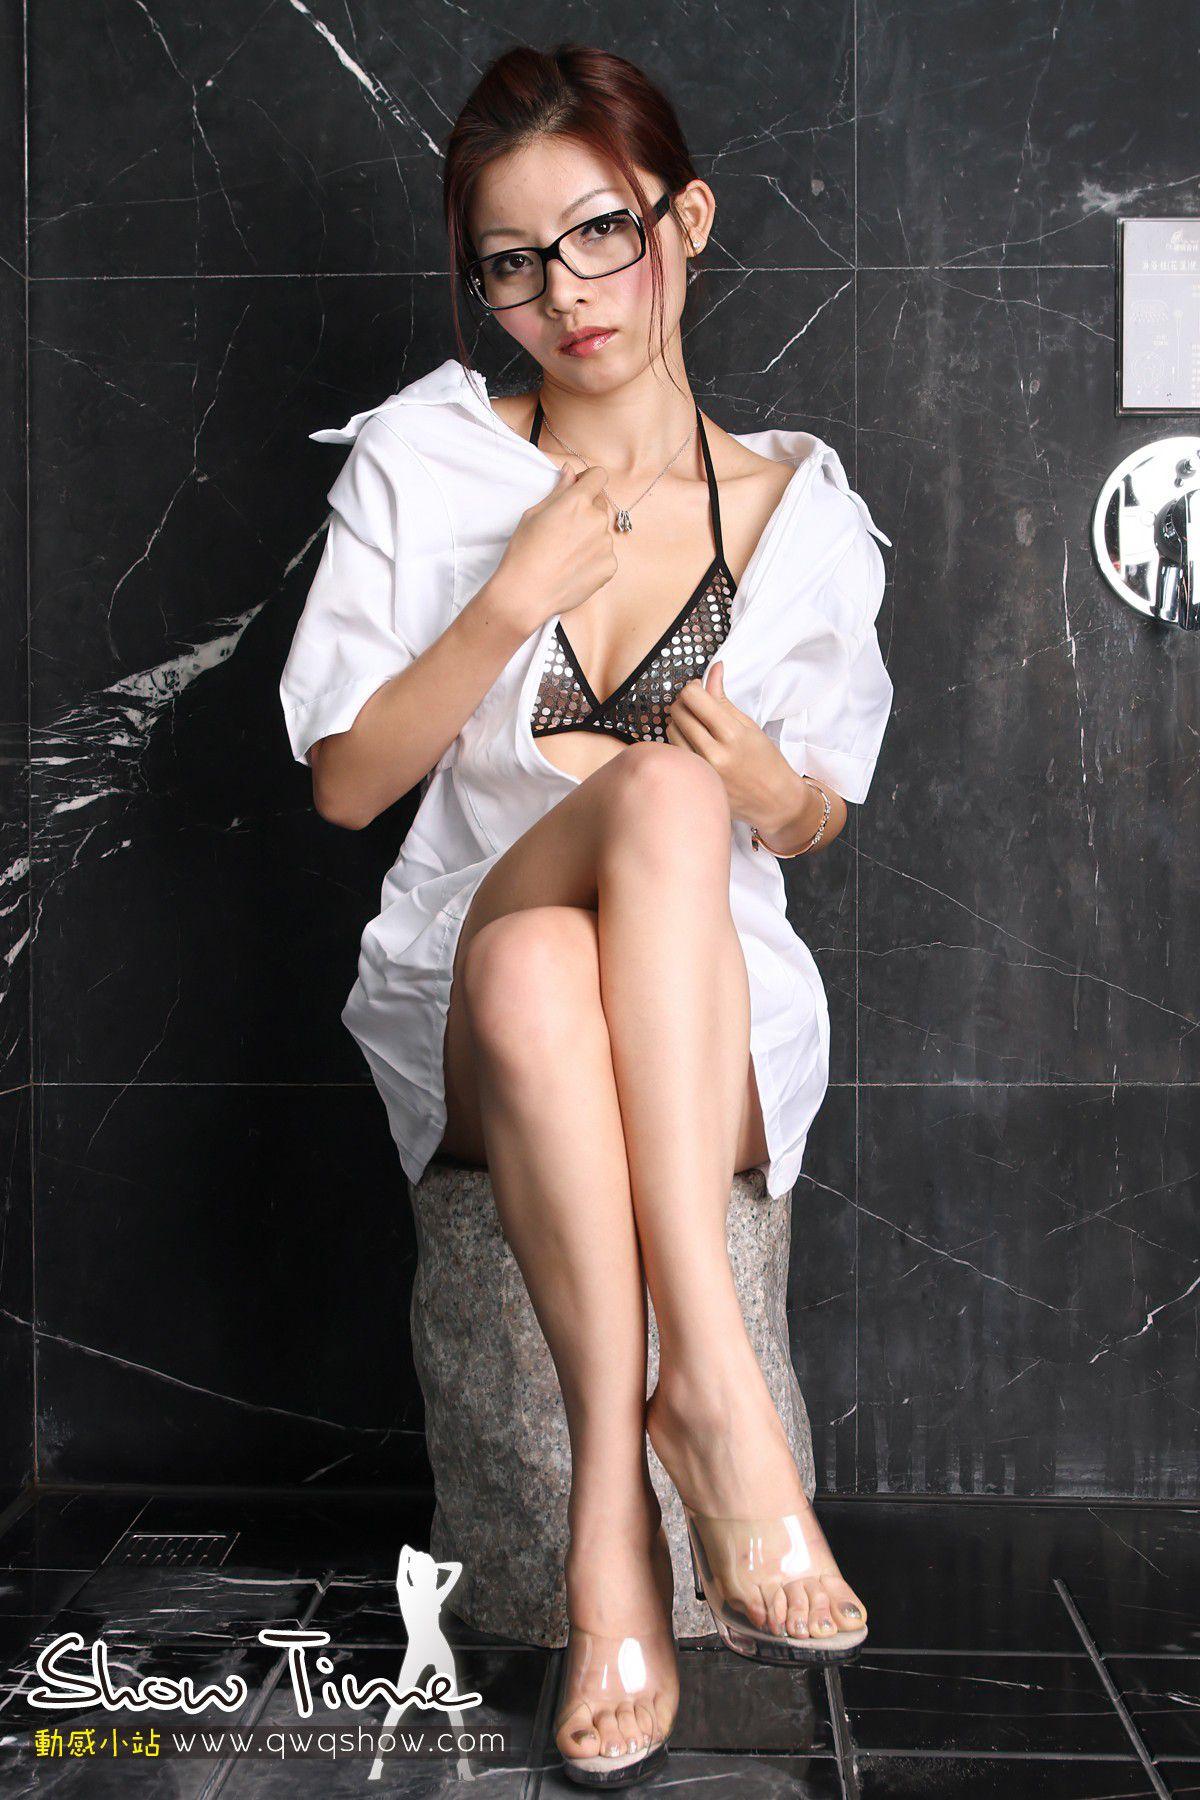 VOL.159 [动感之星]制服医生眼镜娘:小蝶(动感小站小蝶,动感之星小蝶)高品质写真套图(50P)